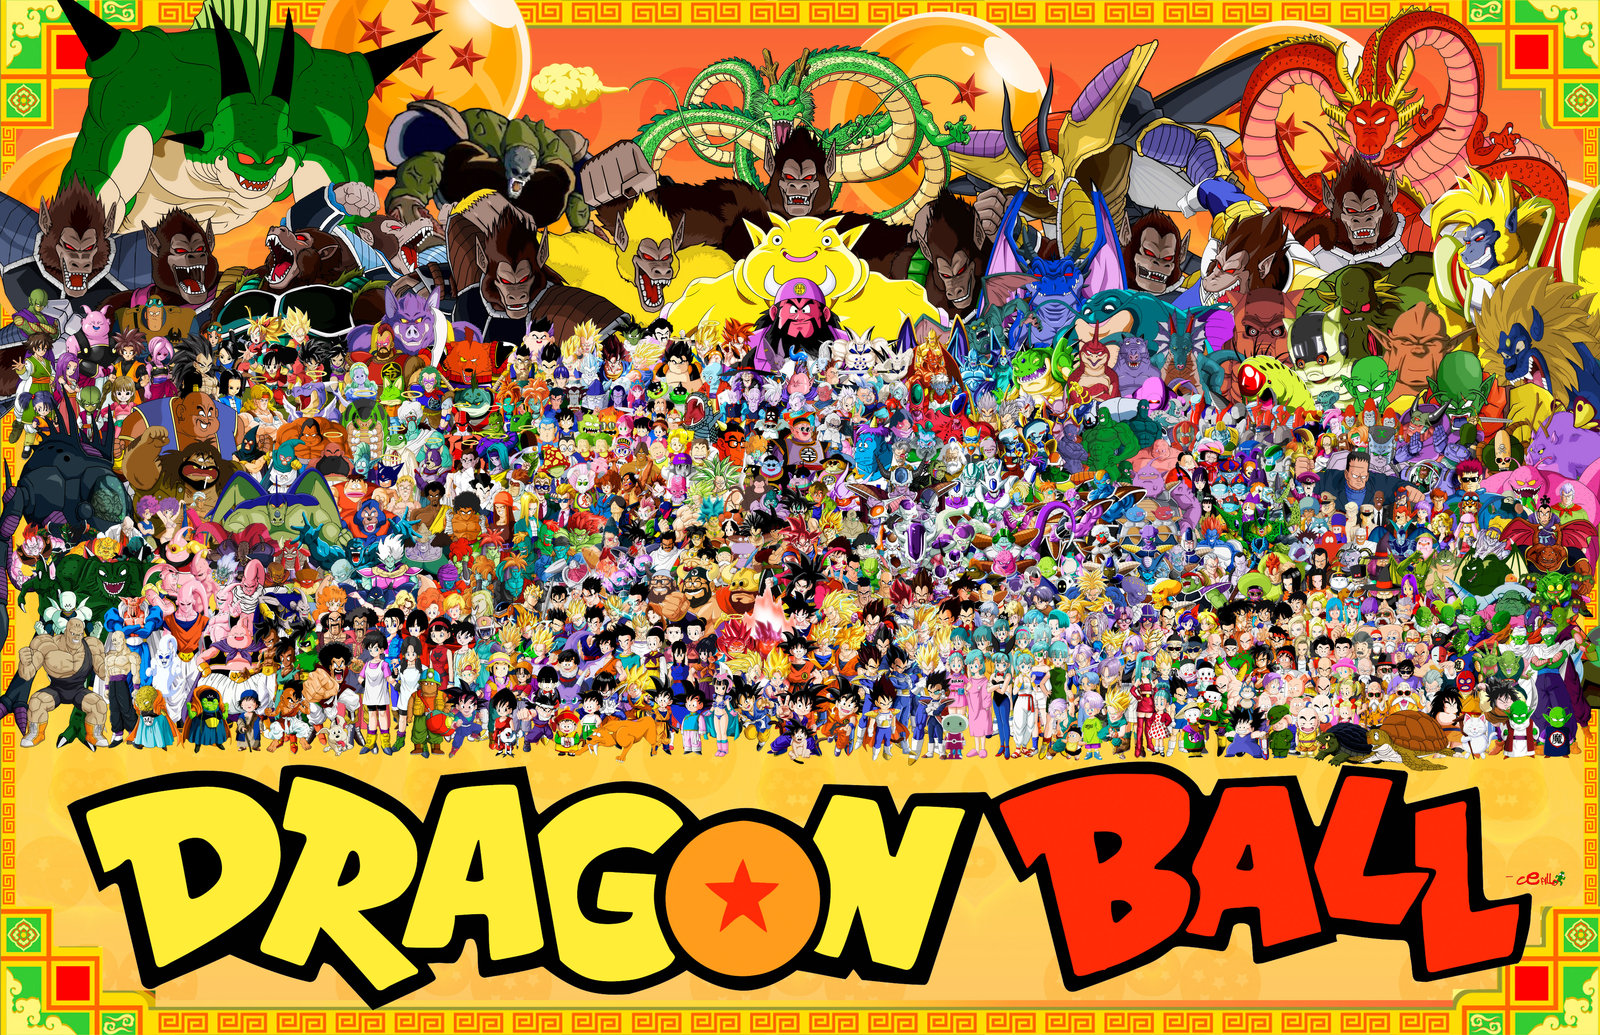 DRAGON BALL universe wallpaper by Cepillo16 1600x1035